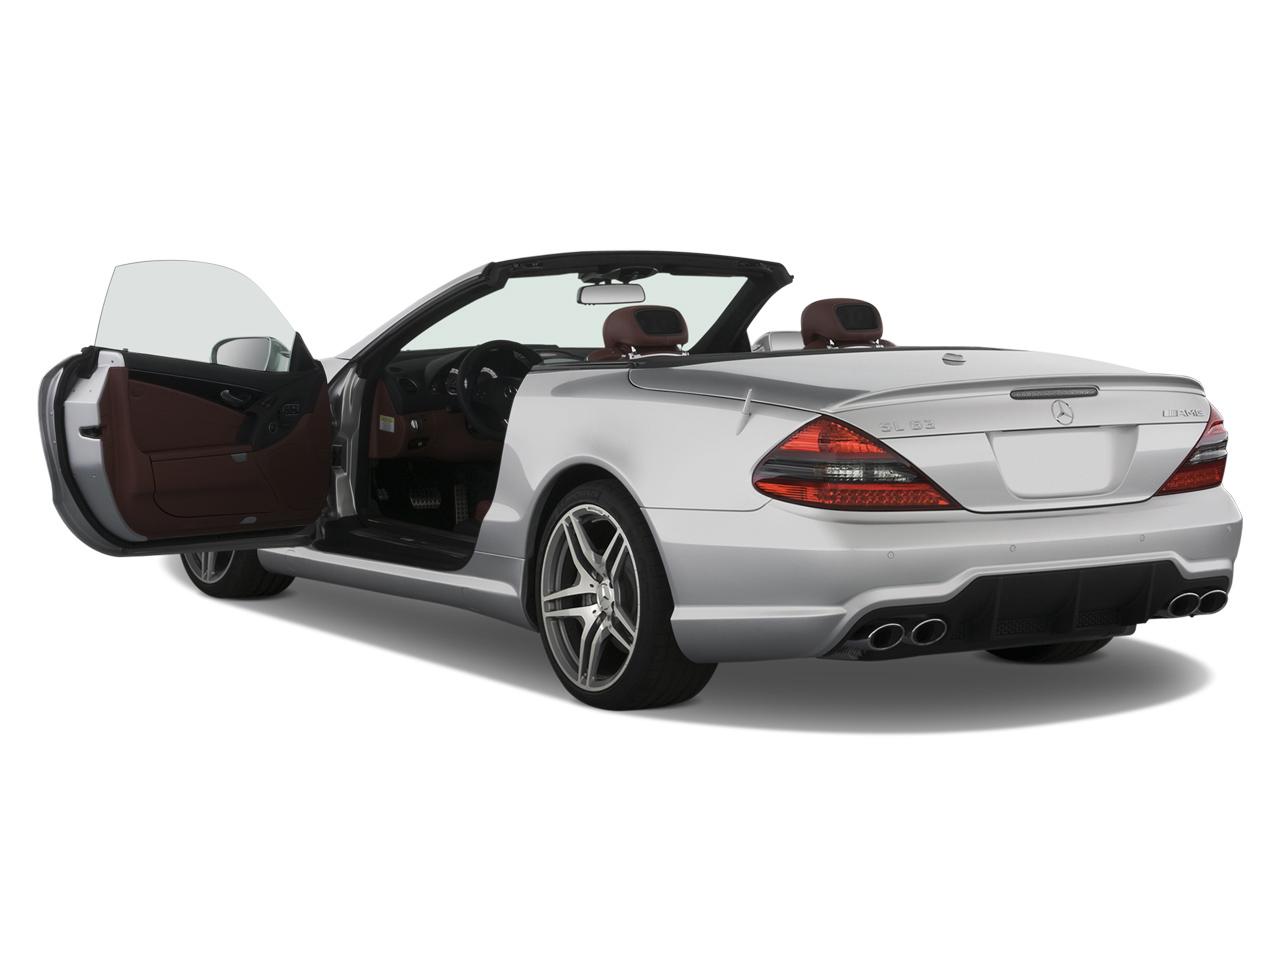 2009 mercedes benz sl63 amg roadster mercedes benz luxury convertible review automobile magazine. Black Bedroom Furniture Sets. Home Design Ideas